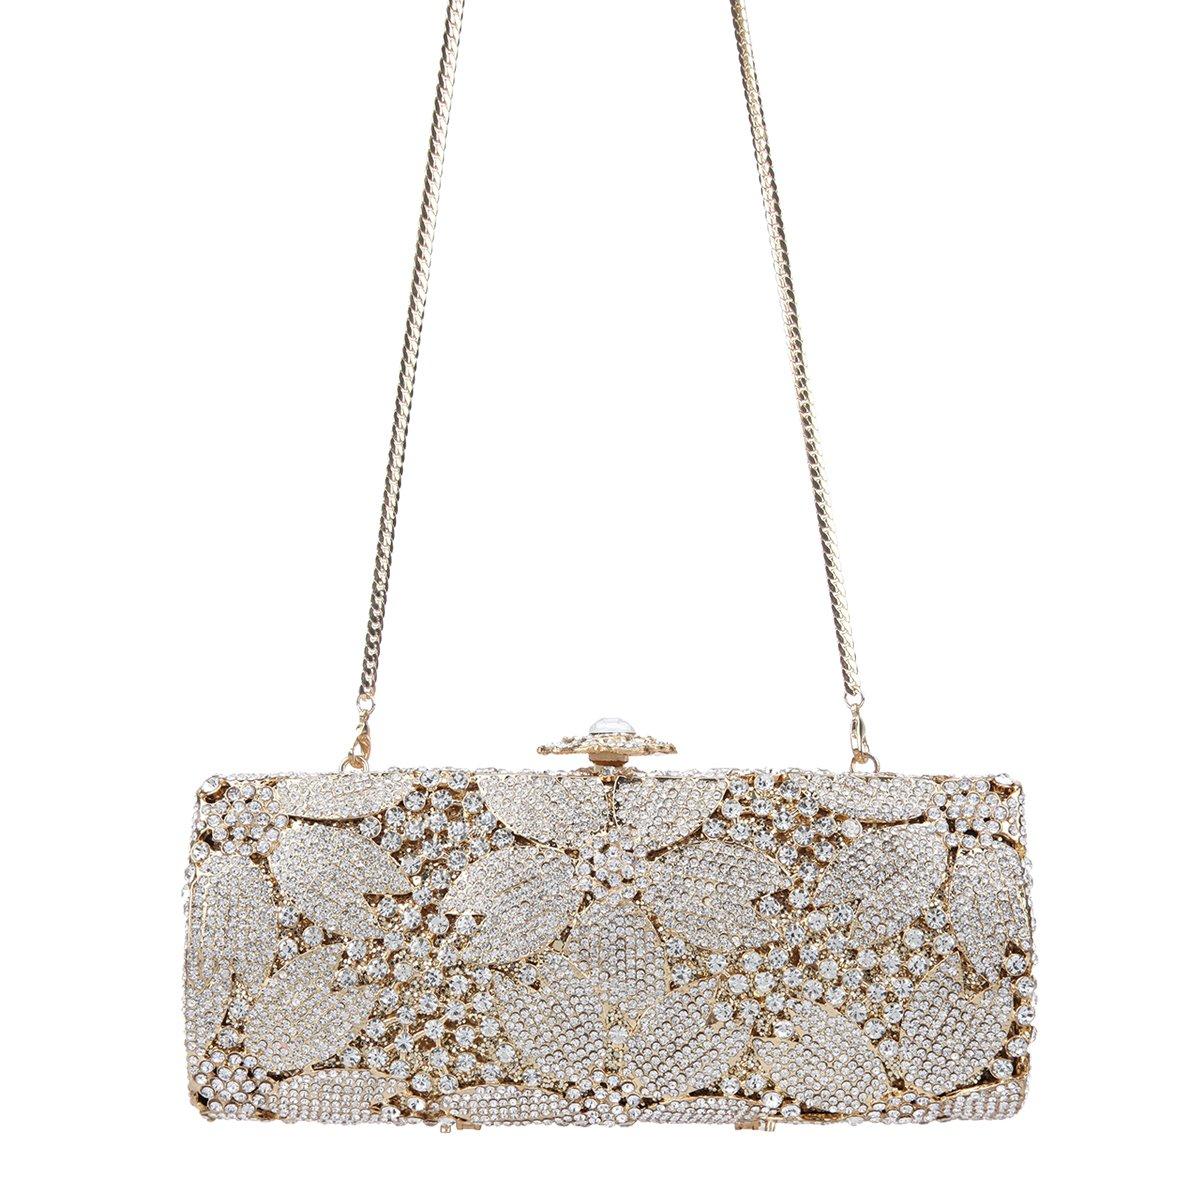 Fawziya Sakura Flower Hard Case Purse Luxury Crystal Evening Clutch Handbag